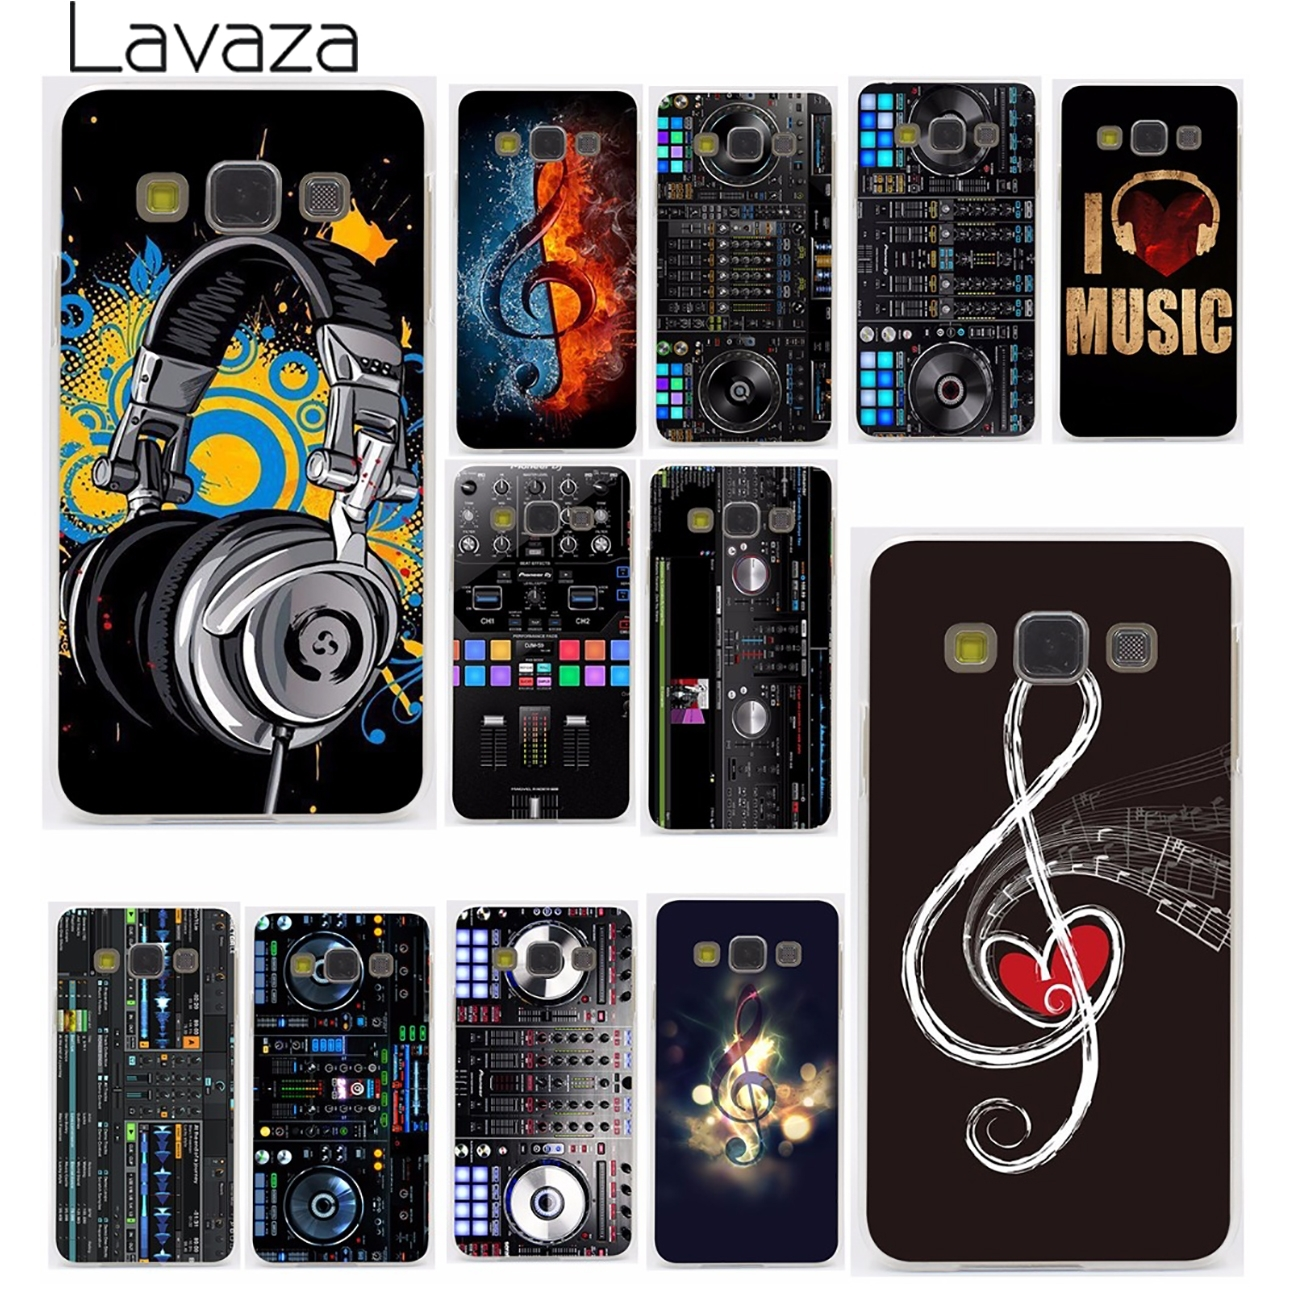 Lavaza ddj dj music Hard for Samsung Galaxy A3 A5 A7 A8 2015 2016 2017 2018 Note 8 5 4 3 2 Grand Prime 2